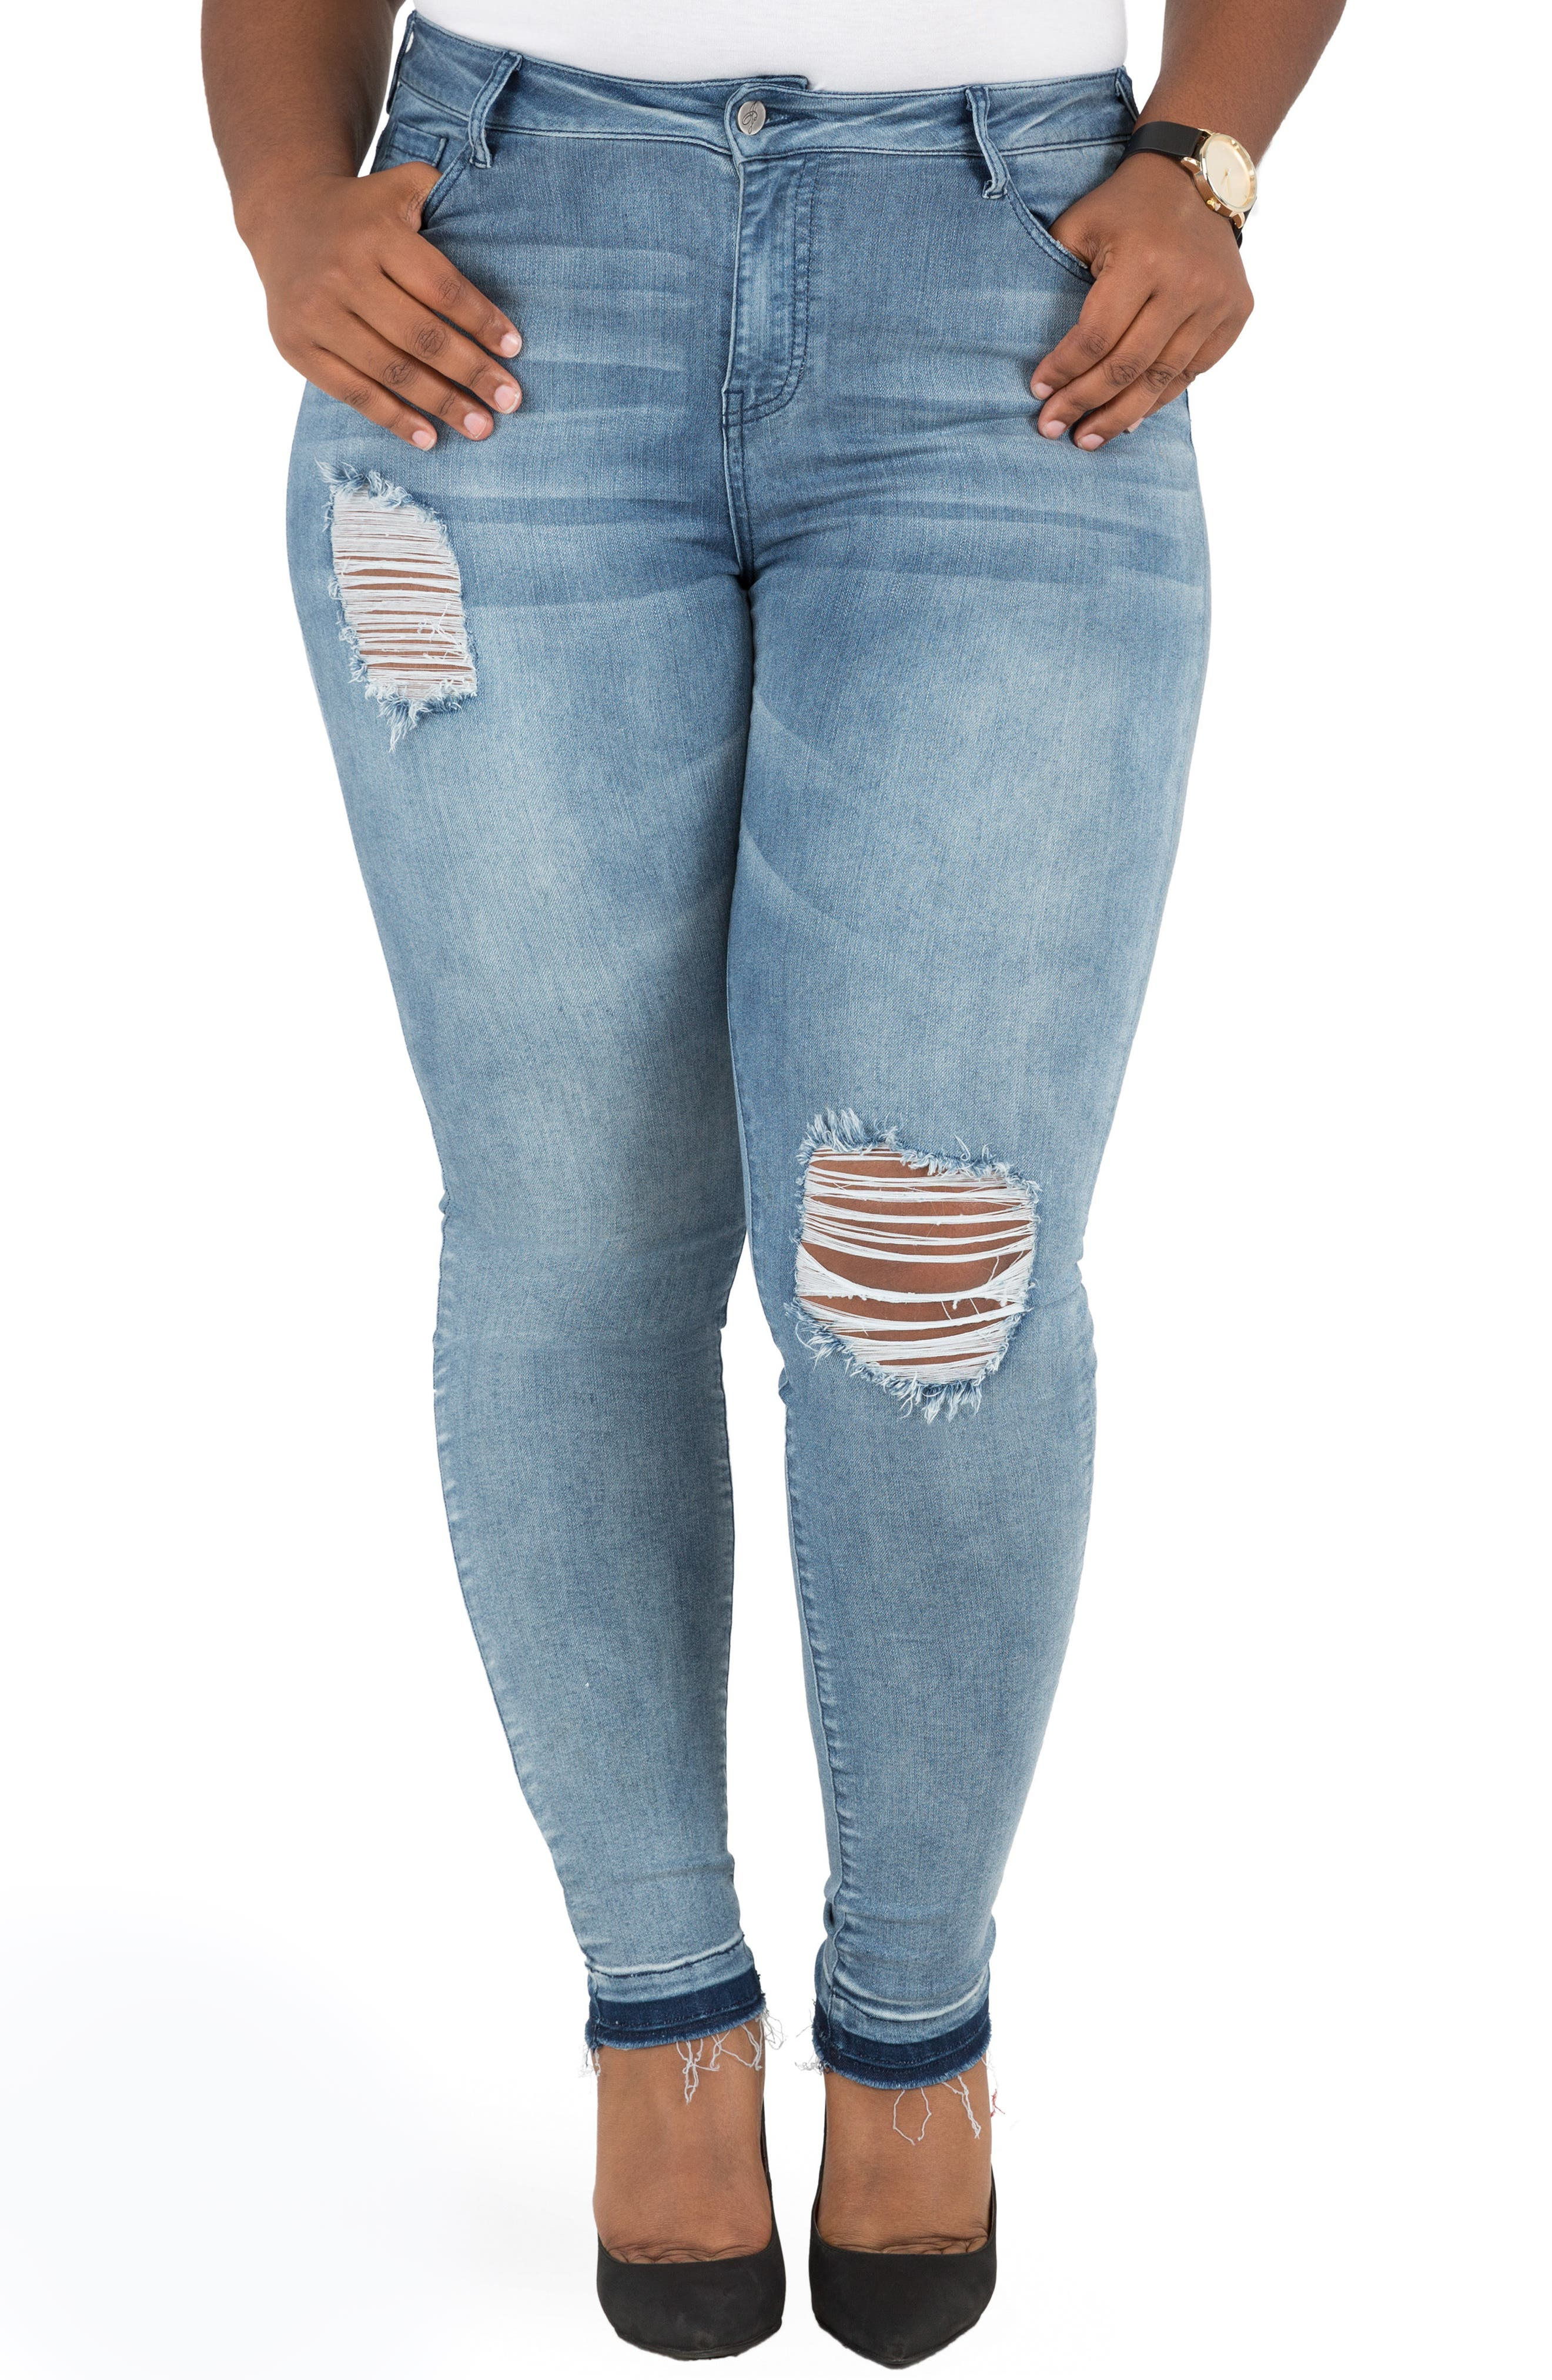 Corrine Release Hem Skinny Crop Jeans,                             Main thumbnail 1, color,                             LIGHT BLUE